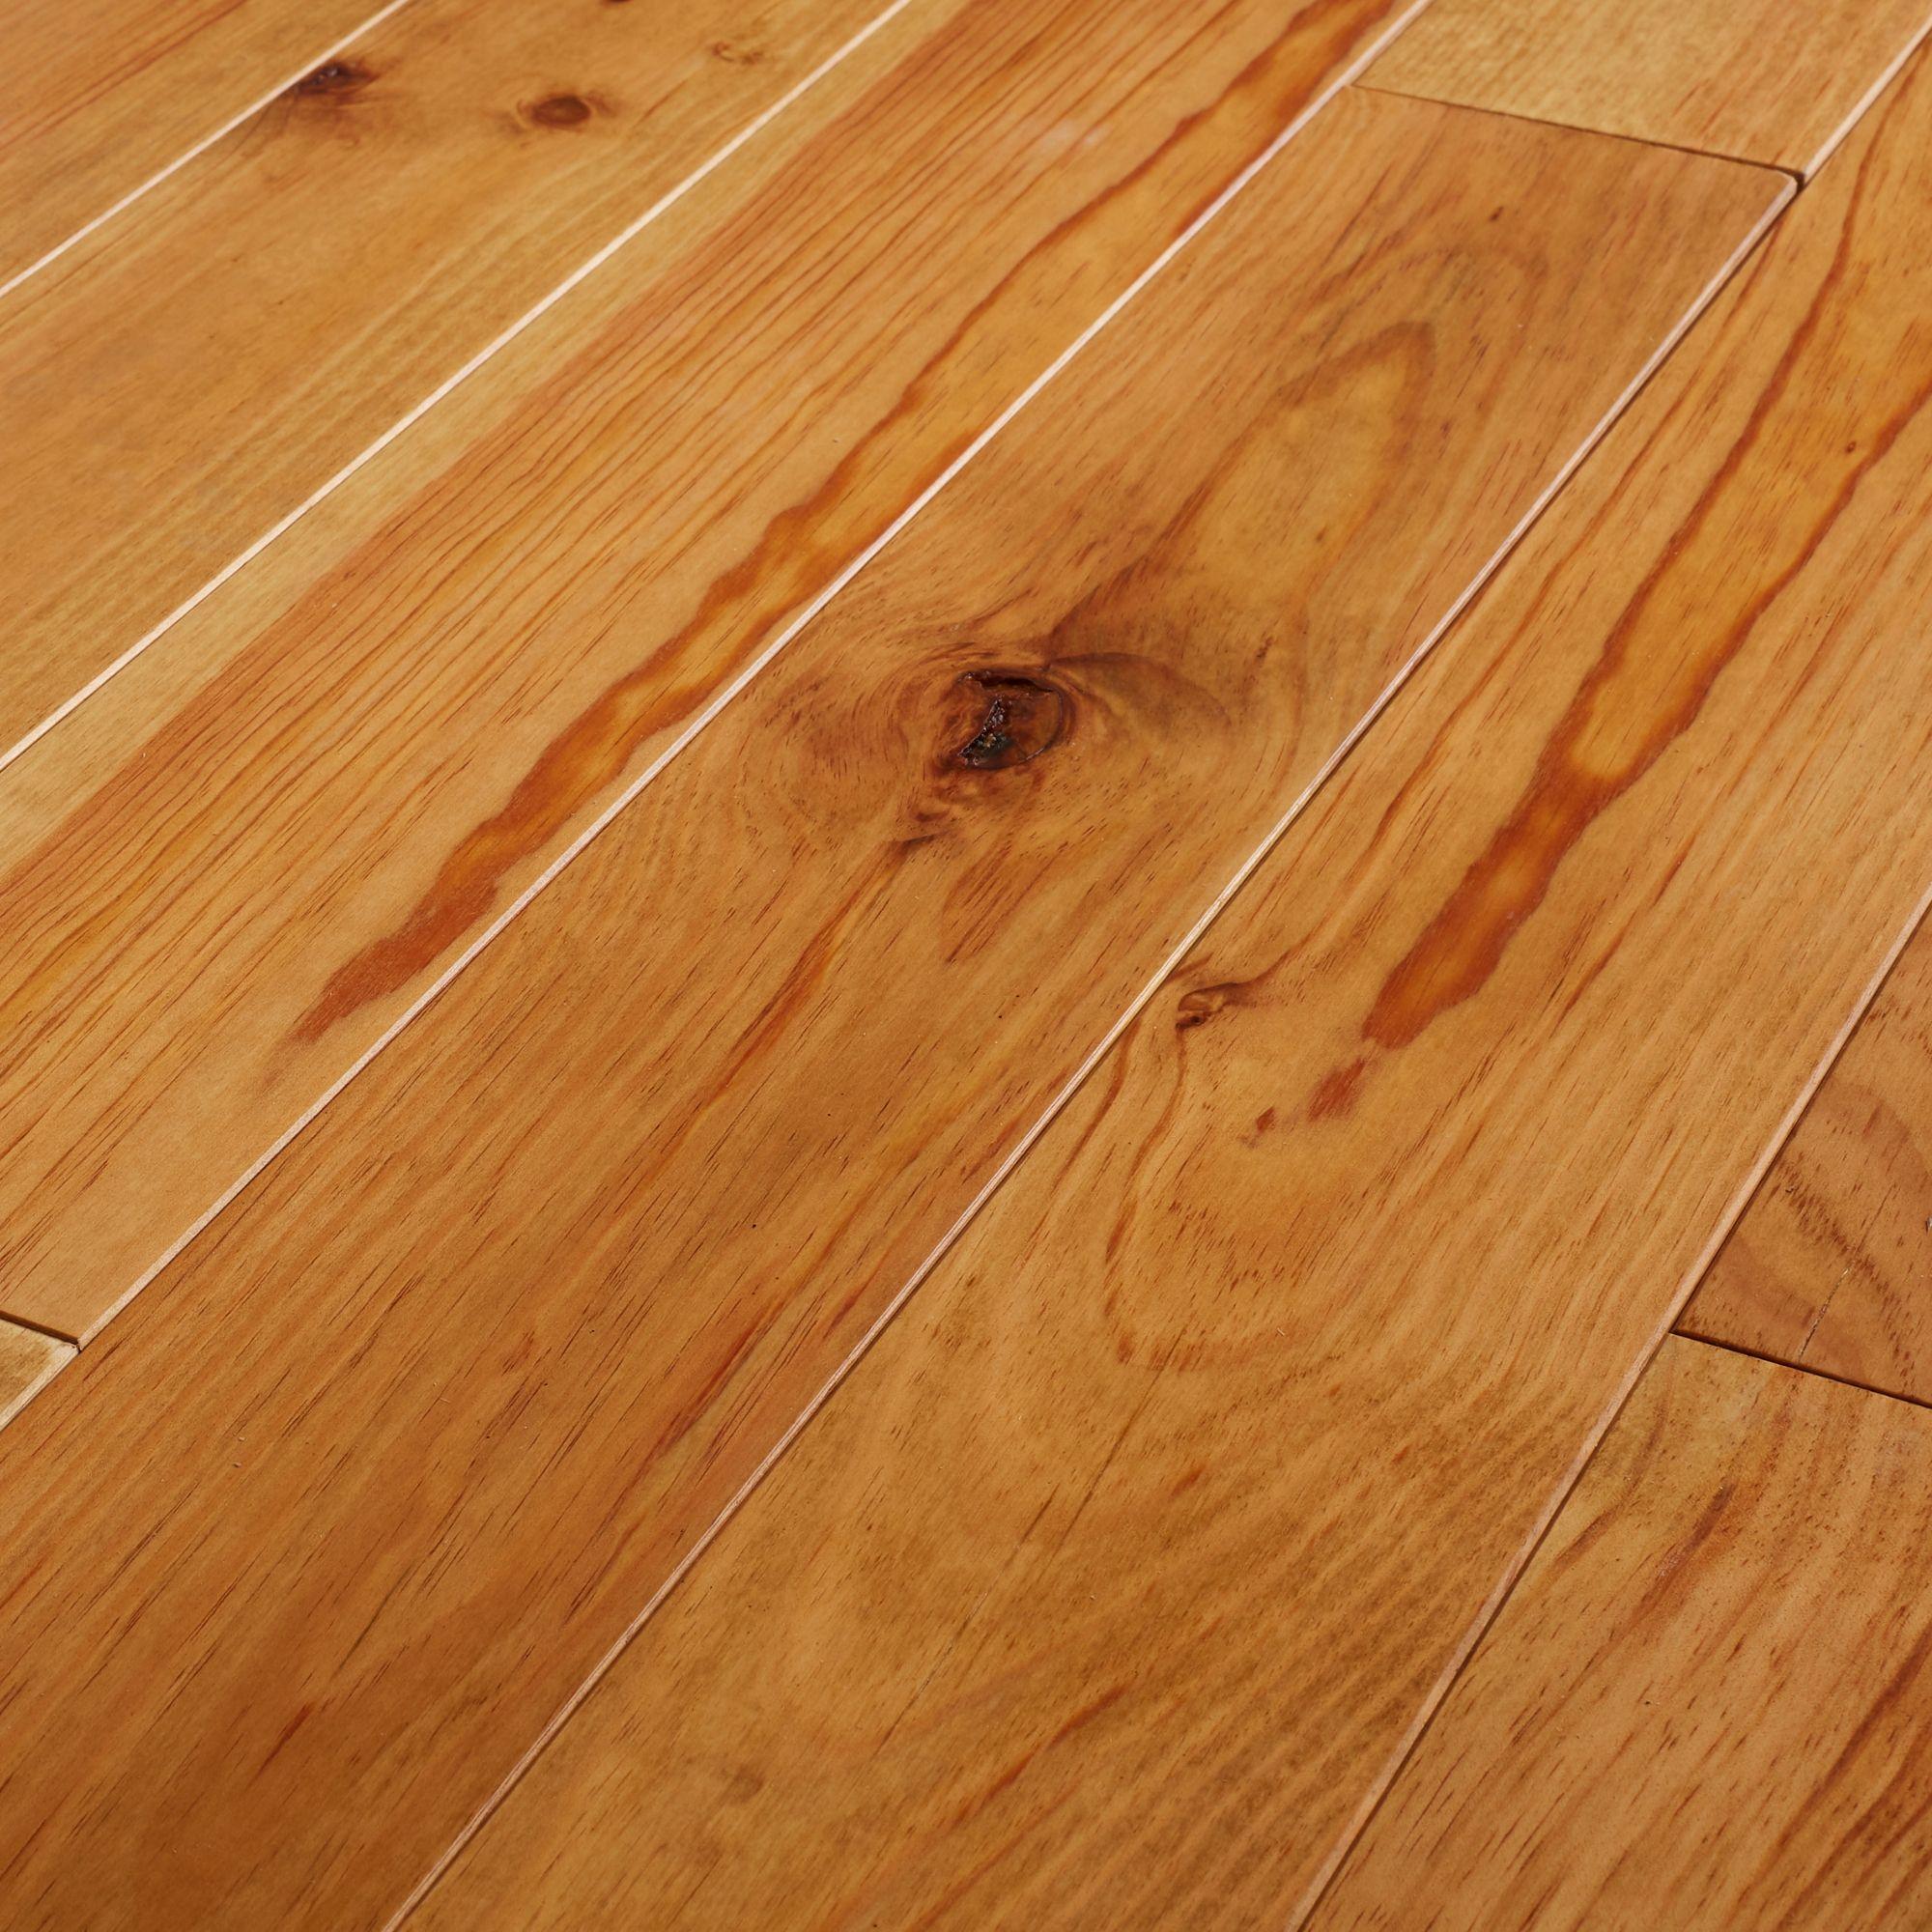 Goodhome Granna Natural Pine Solid Wood Flooring 0 96m Pack Departments Diy At B Q